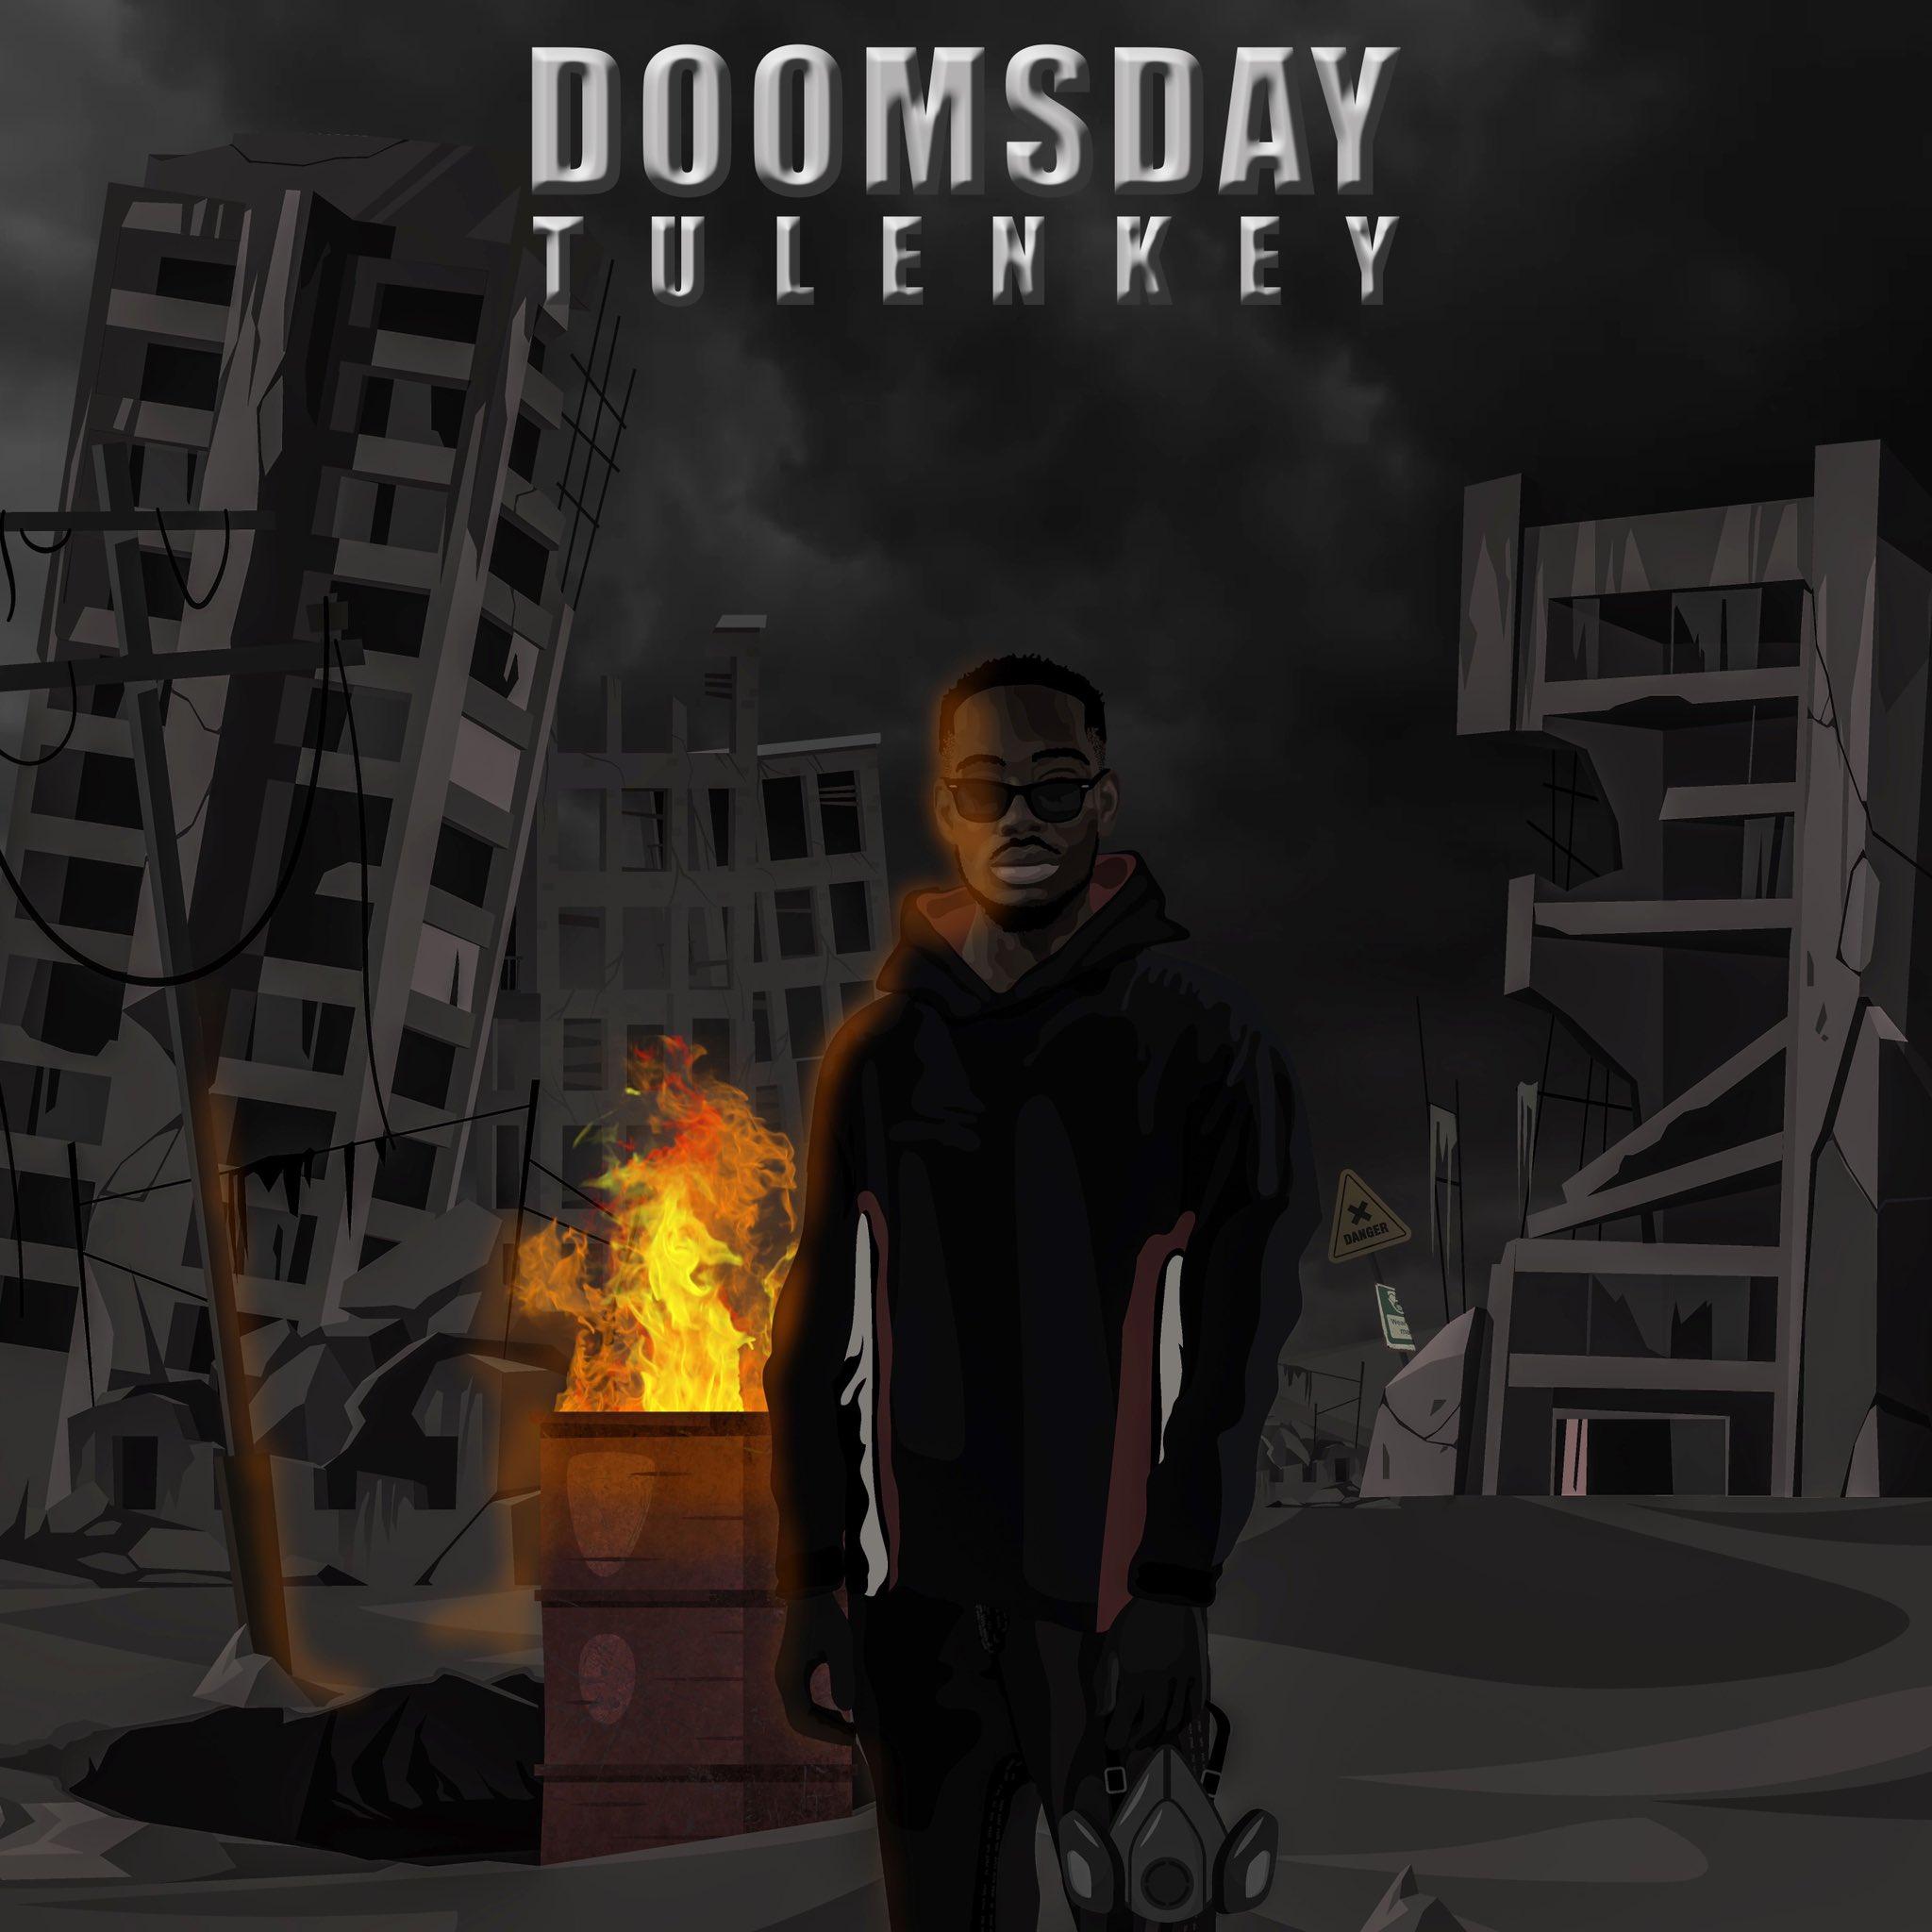 Tulenkey - Doomsday EP [Full Download]